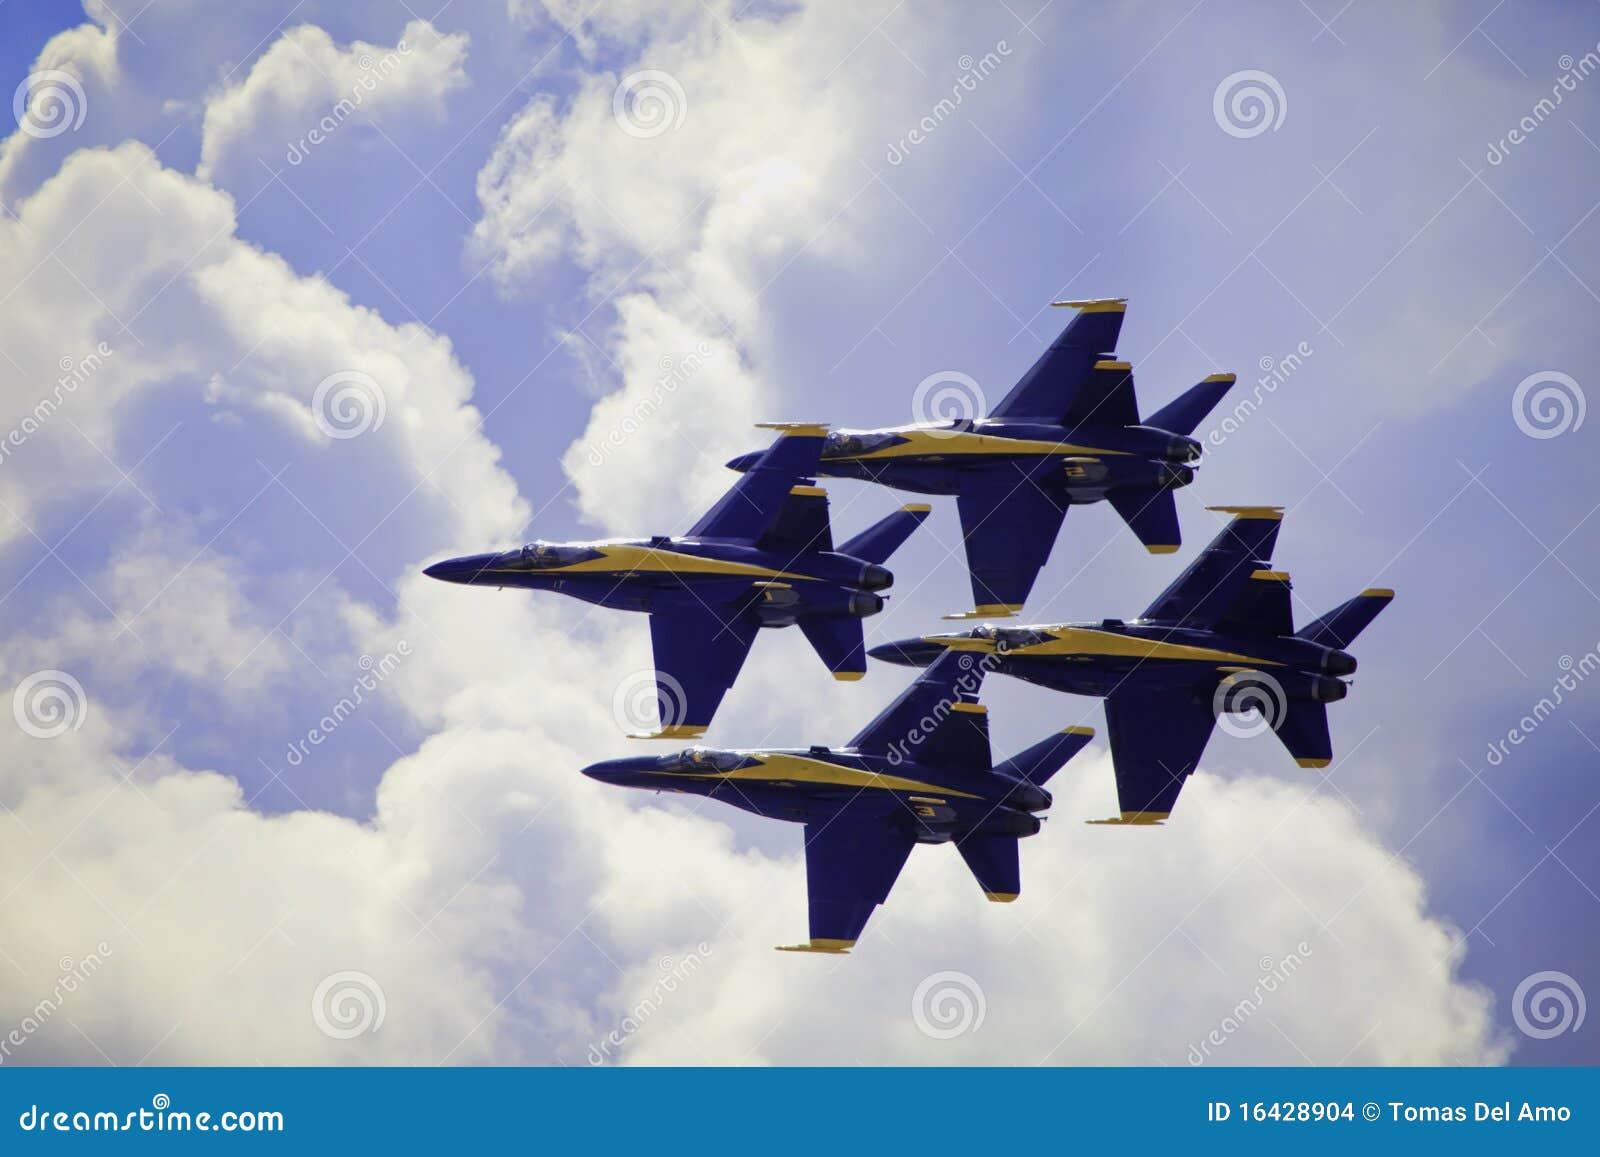 Blaue Engel im Flug